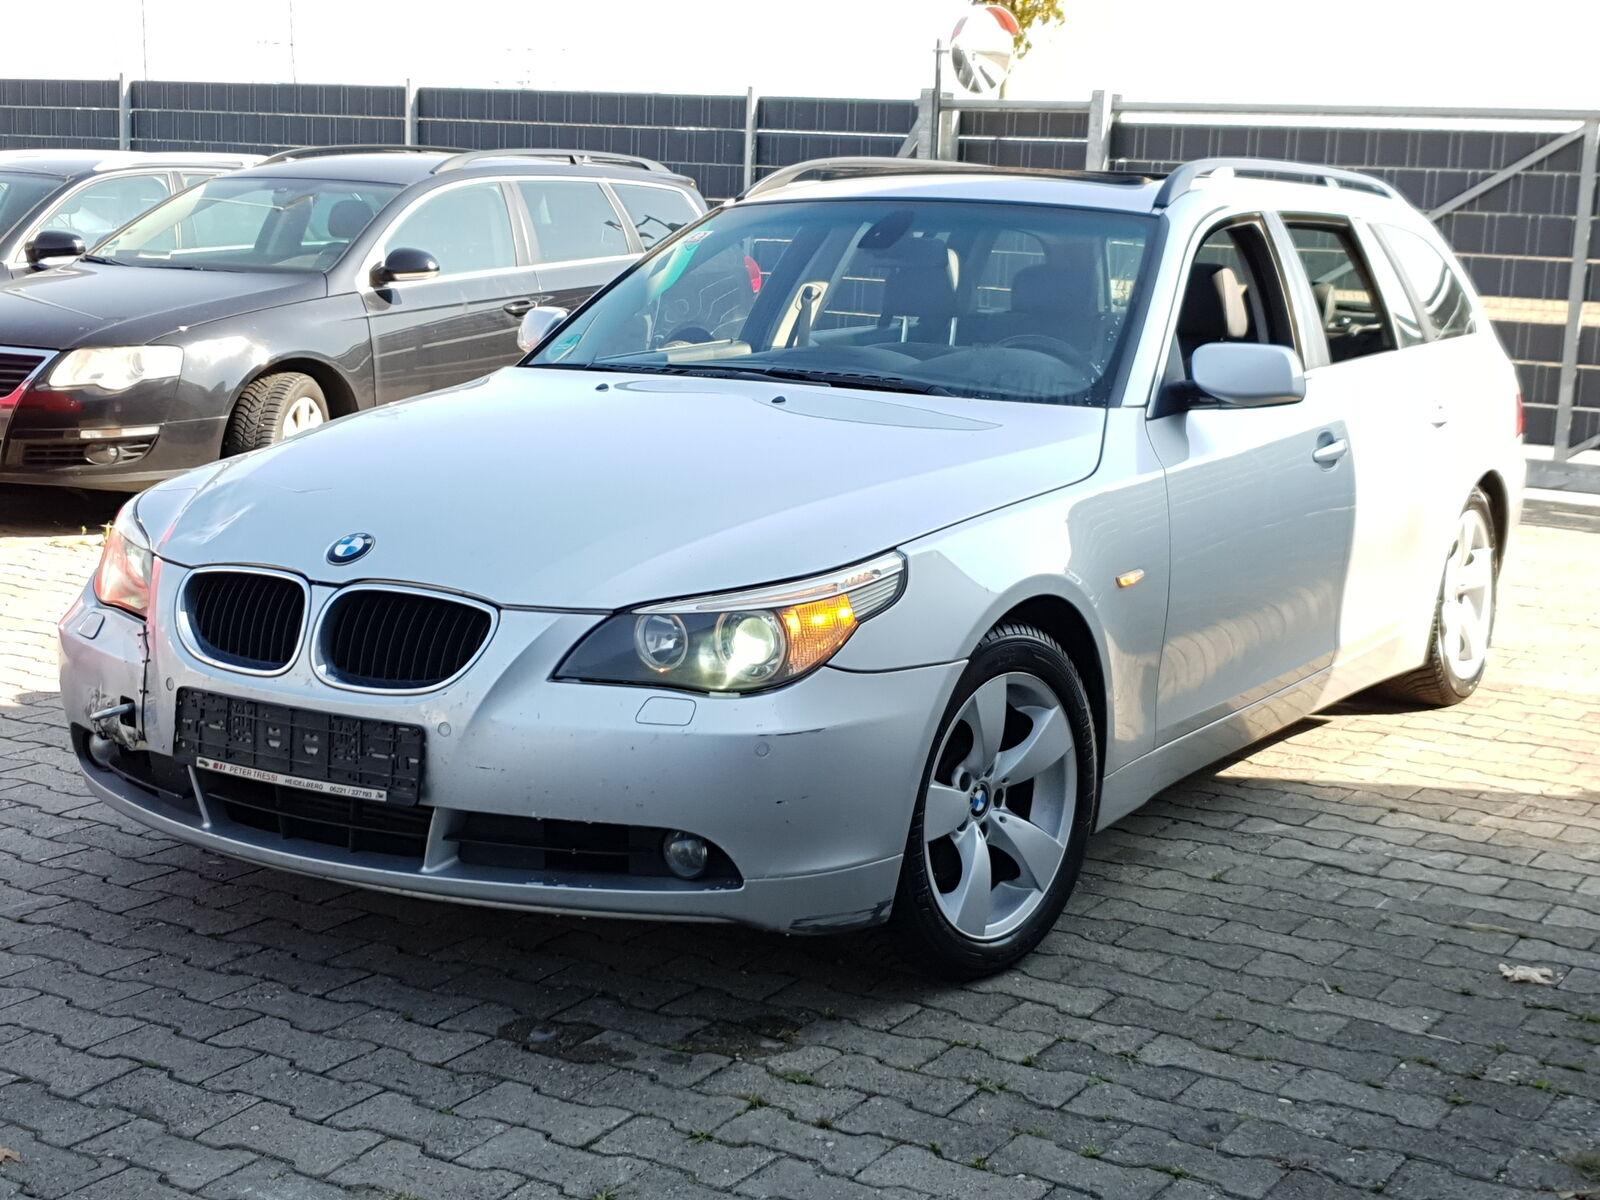 Nockenwelle Auslass für BMW E61 530d 04-07 3,0d 160KW M57TU 306D2-EUR4 7788777 8